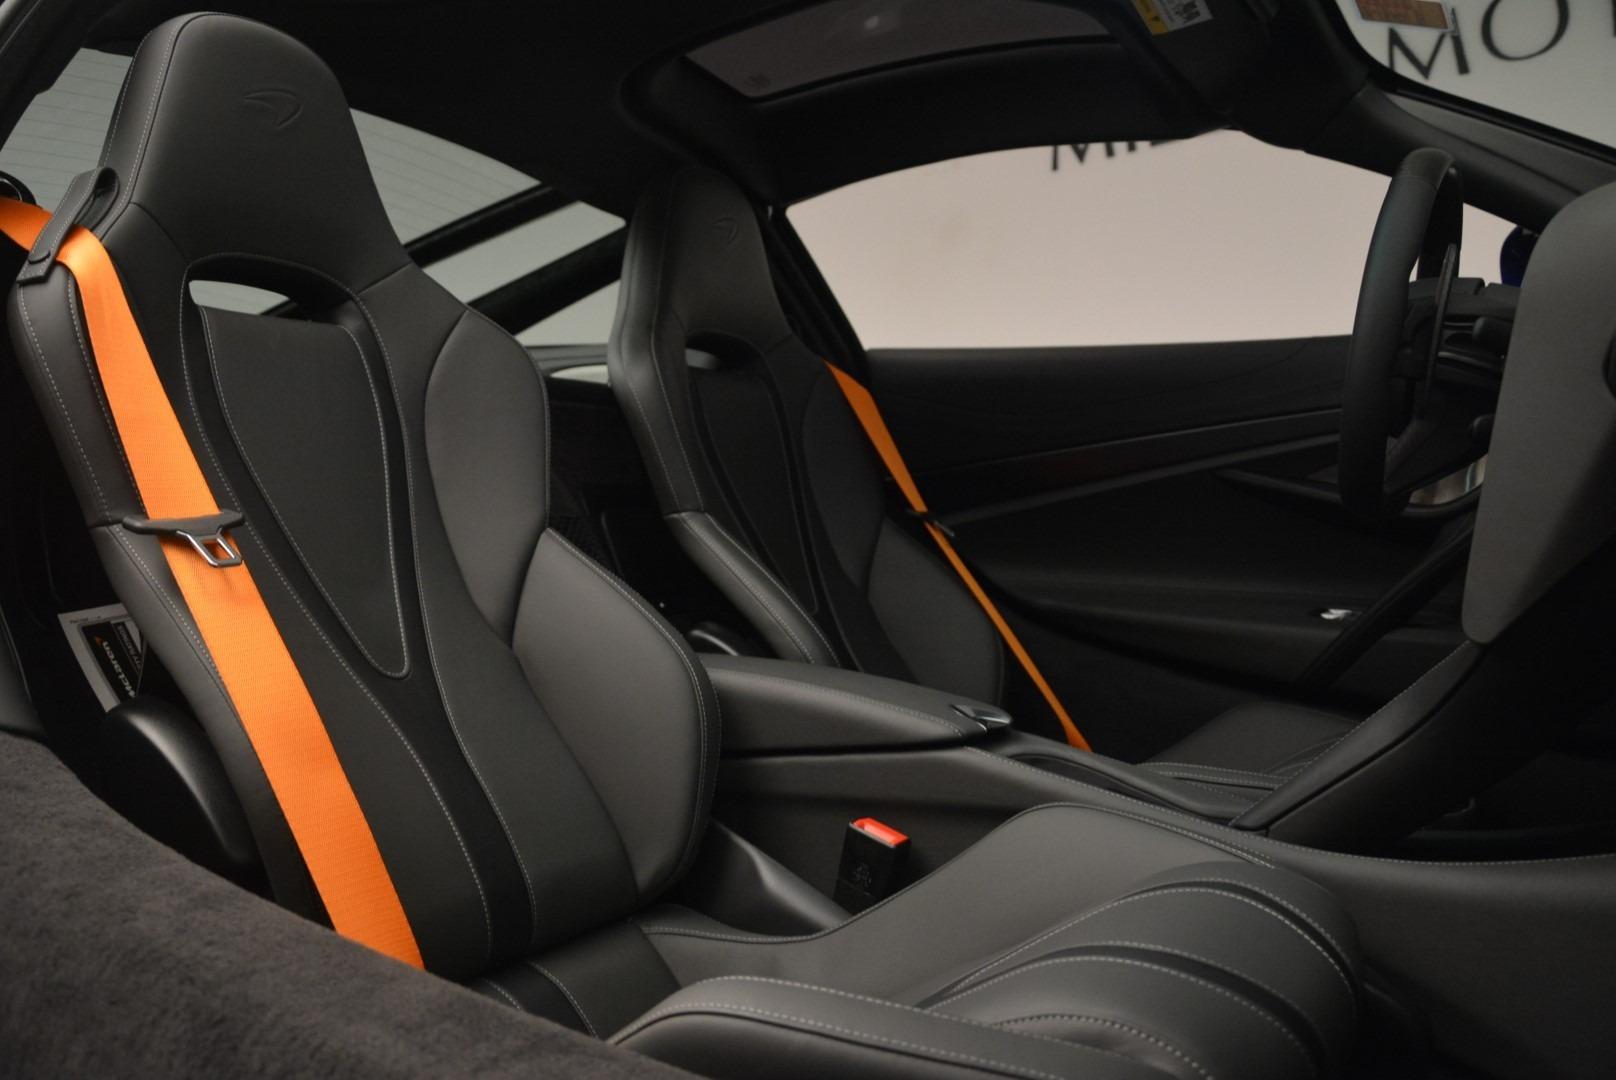 Used 2019 McLaren 720S Coupe For Sale In Westport, CT 2516_p21